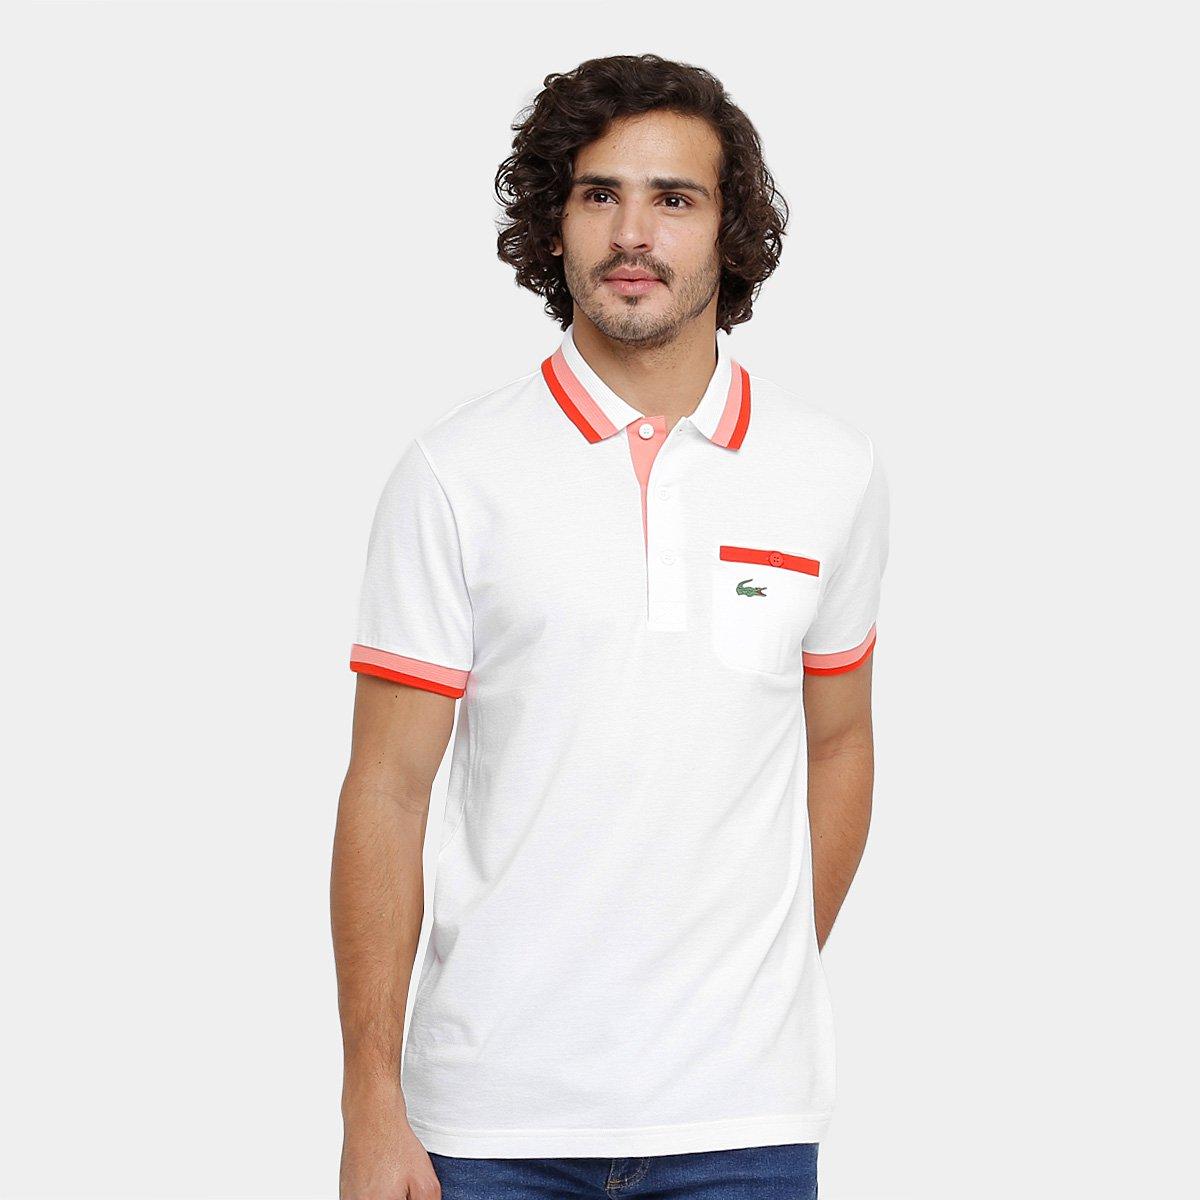 e359f325a34ce ... Camisa Polo Lacoste Bolso Botão Masculina - Compre Agora Zattini  0ec061183d6e51 ...